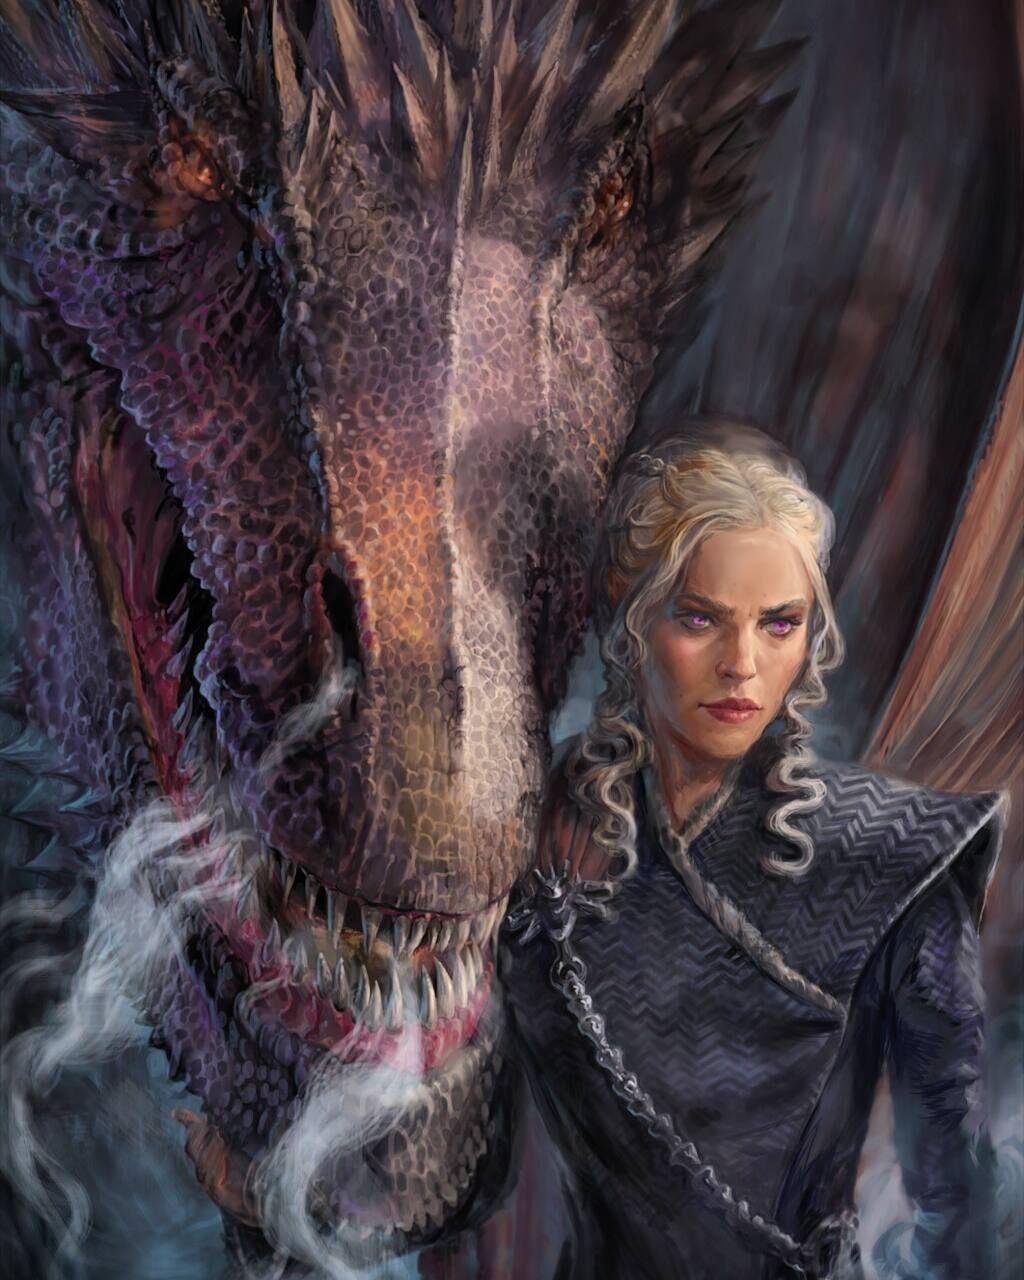 Polubienia 6 530 Komentarze 7 Game Of Thrones Art Of Ice